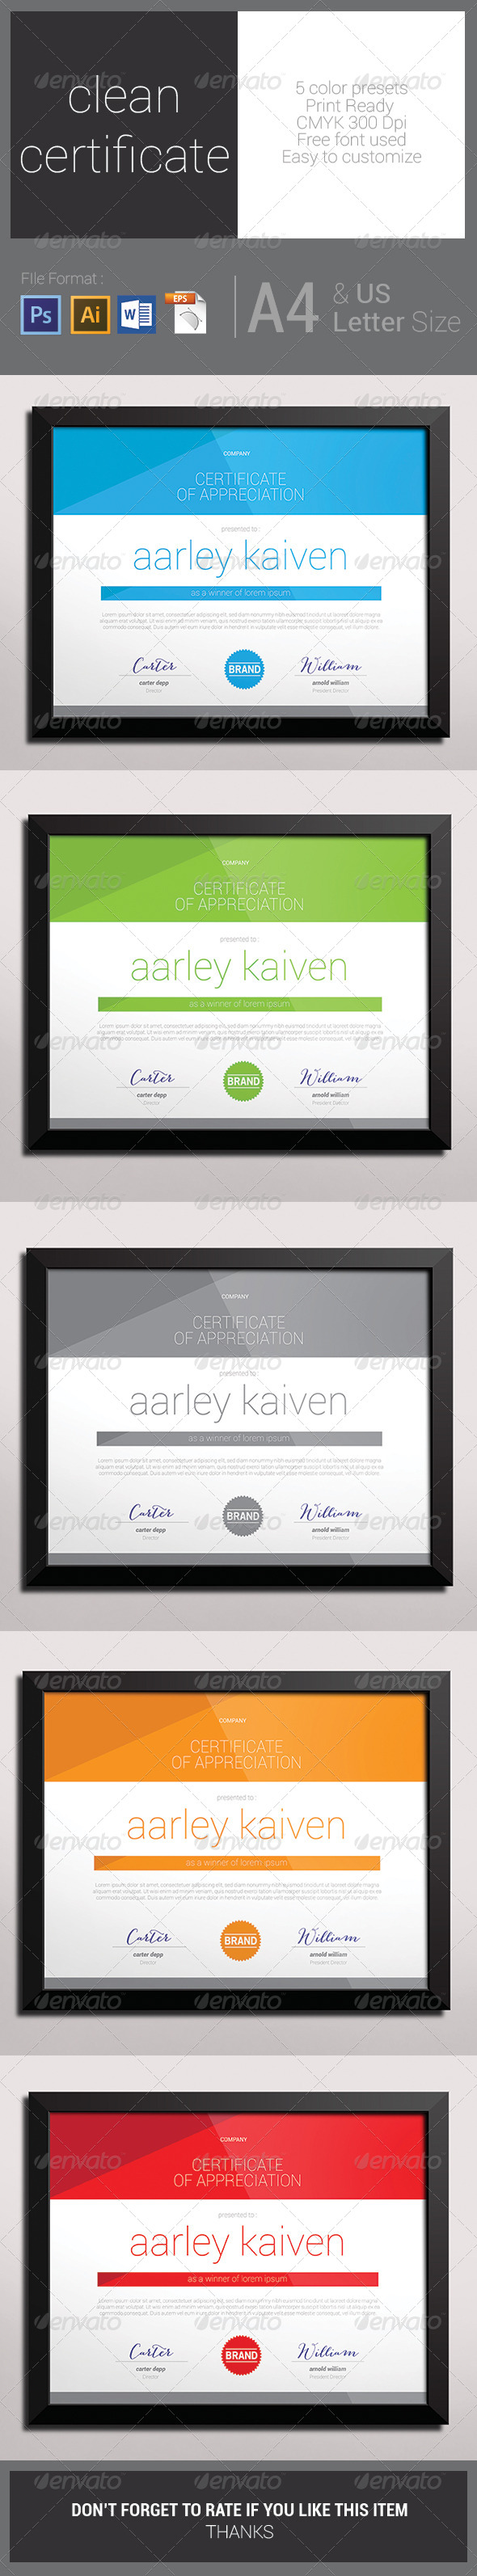 GraphicRiver Clean Certificate 7650378